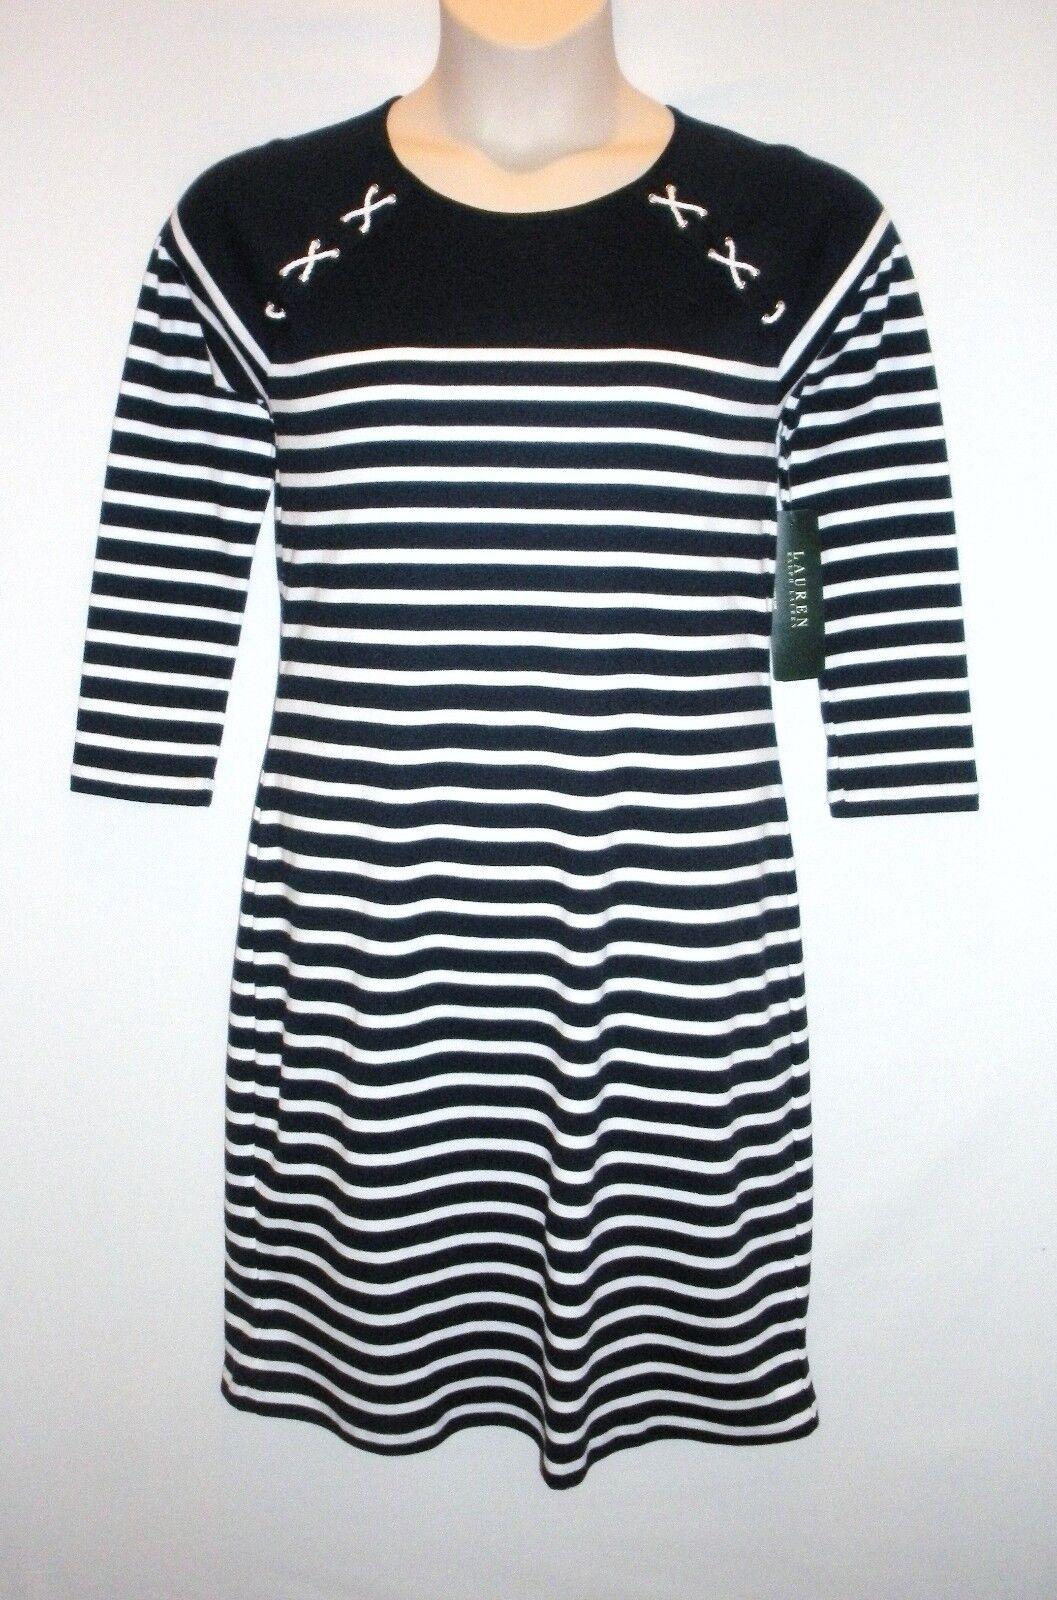 NWT MSRP  125  LAUREN RALPH LAUREN Women's Striped Knit Dress, Navy White, SMALL